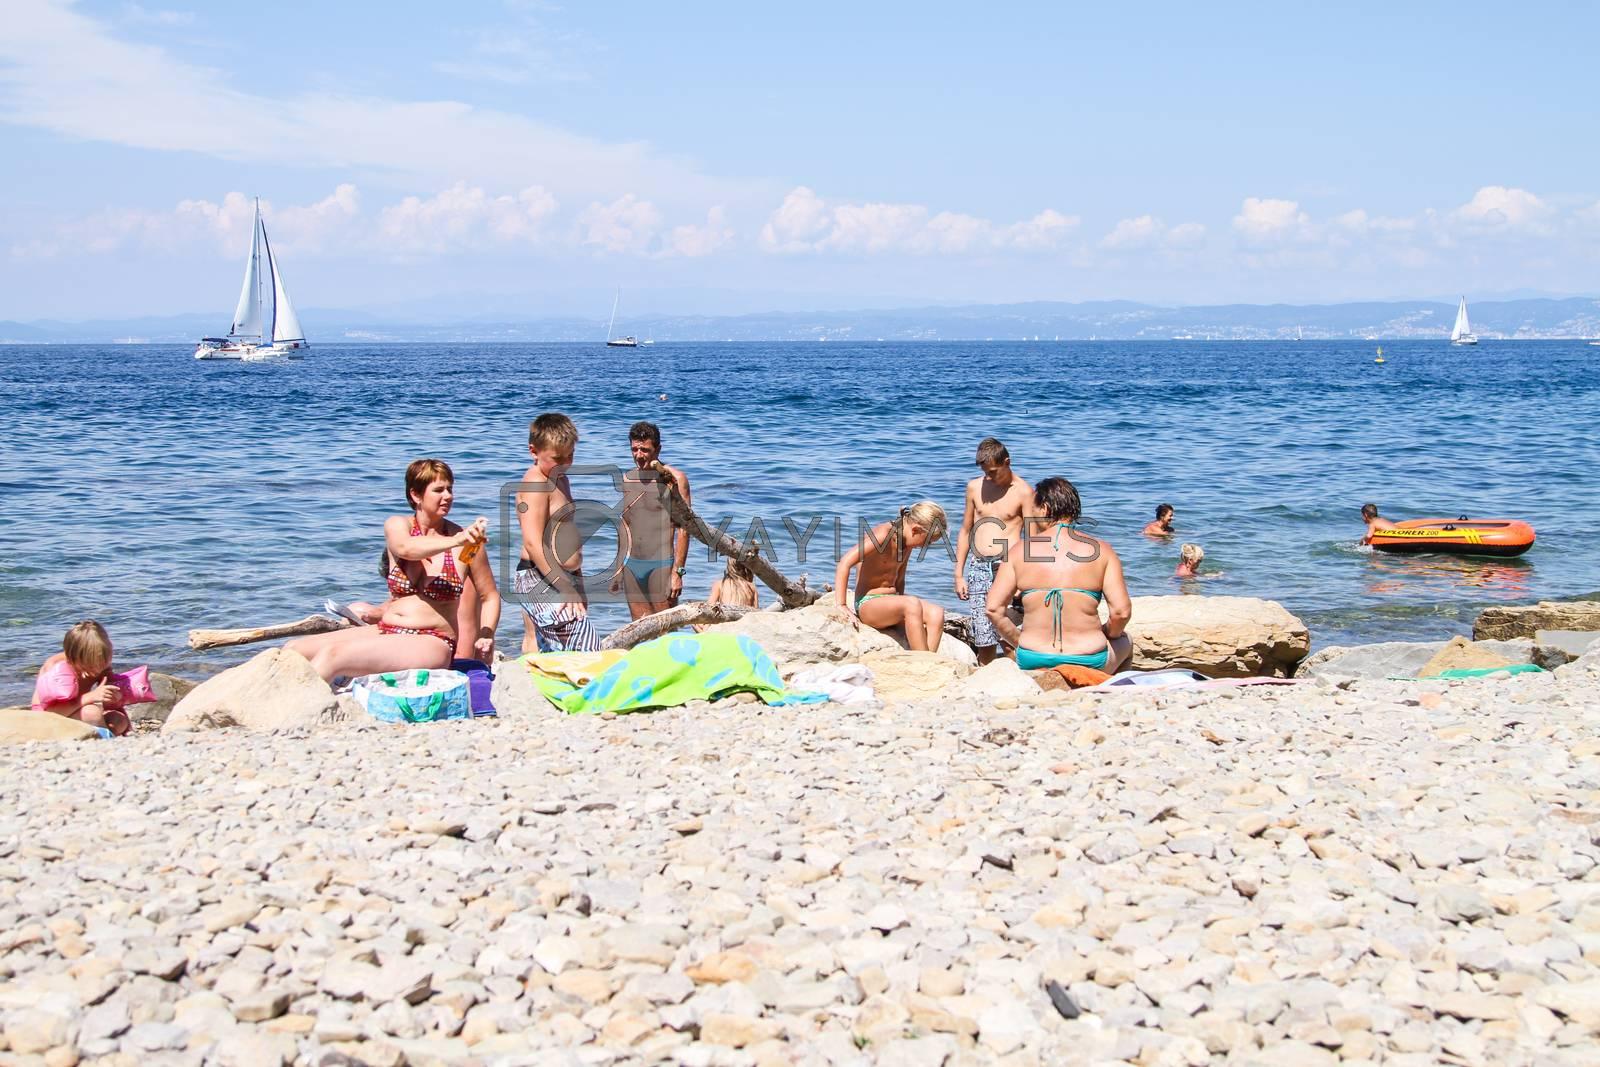 Sunbathing on a beach in Piran, Slovenia